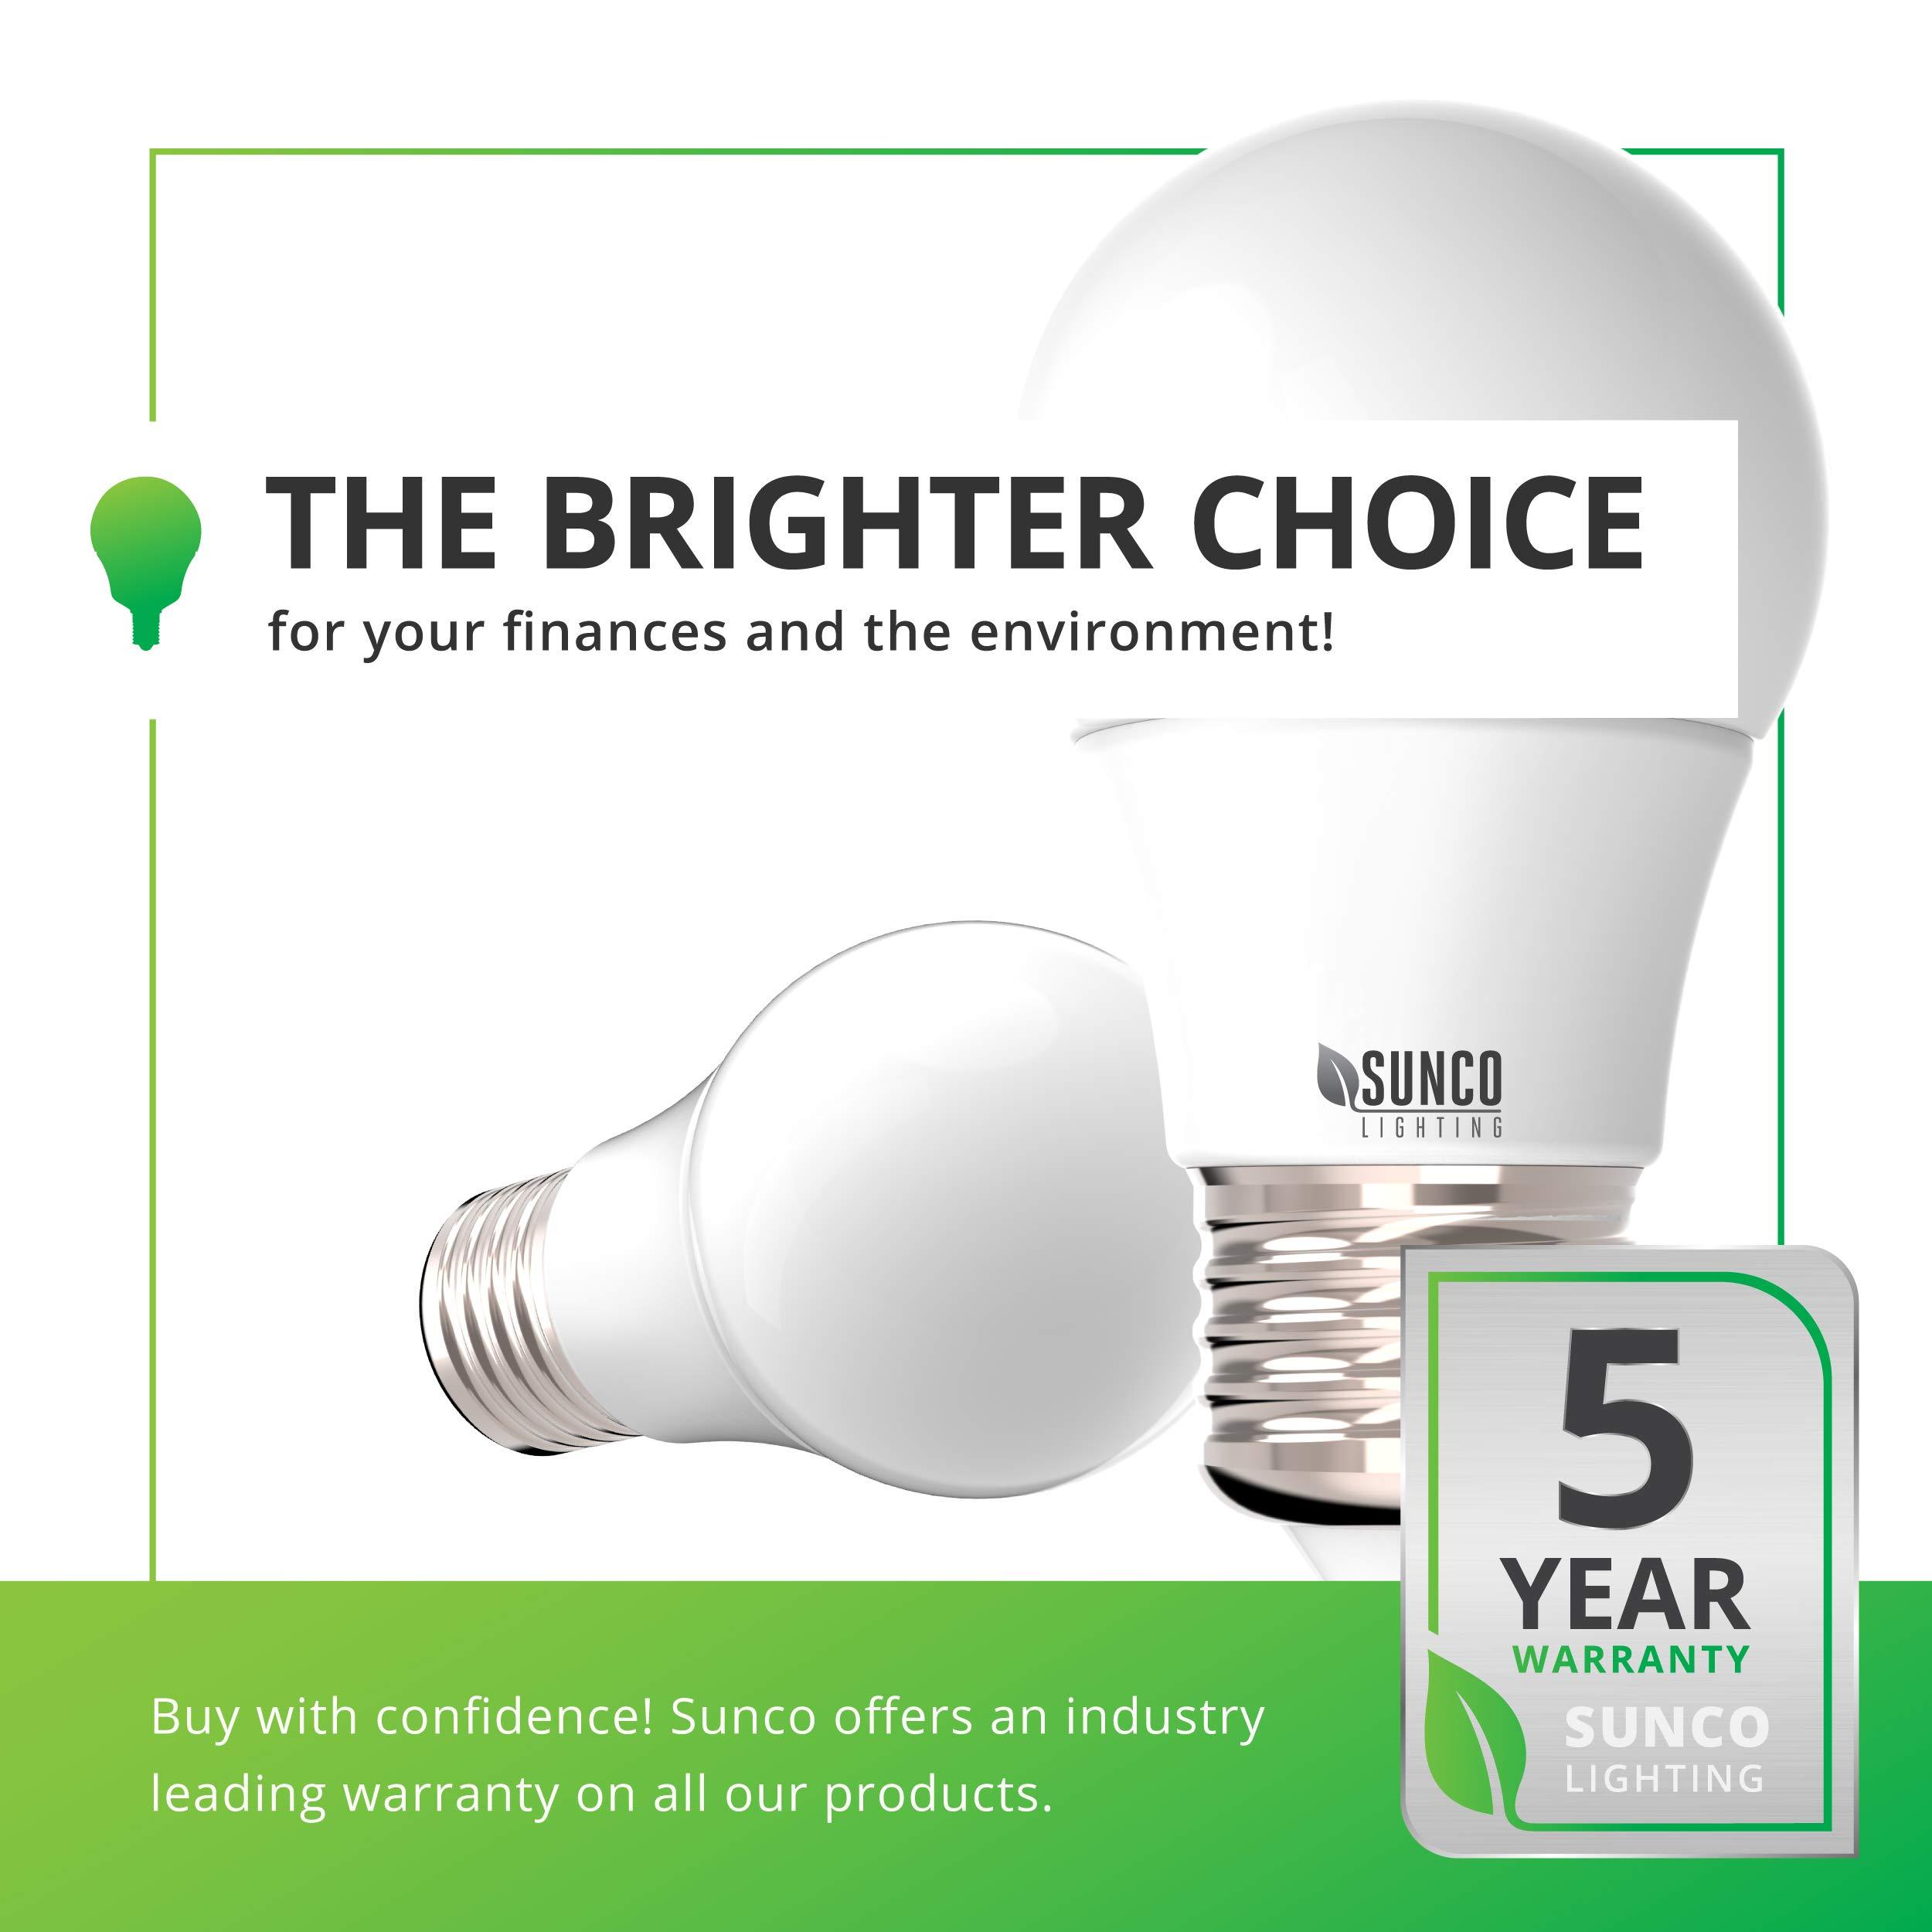 Sunco Lighting 10 Pack A15 LED Bulb, 8W=60W, 3000K Warm White, Dimmable, 800 LM, E26 Base, Refrigerator & Fan Light - UL, Energy Star by Sunco Lighting (Image #8)